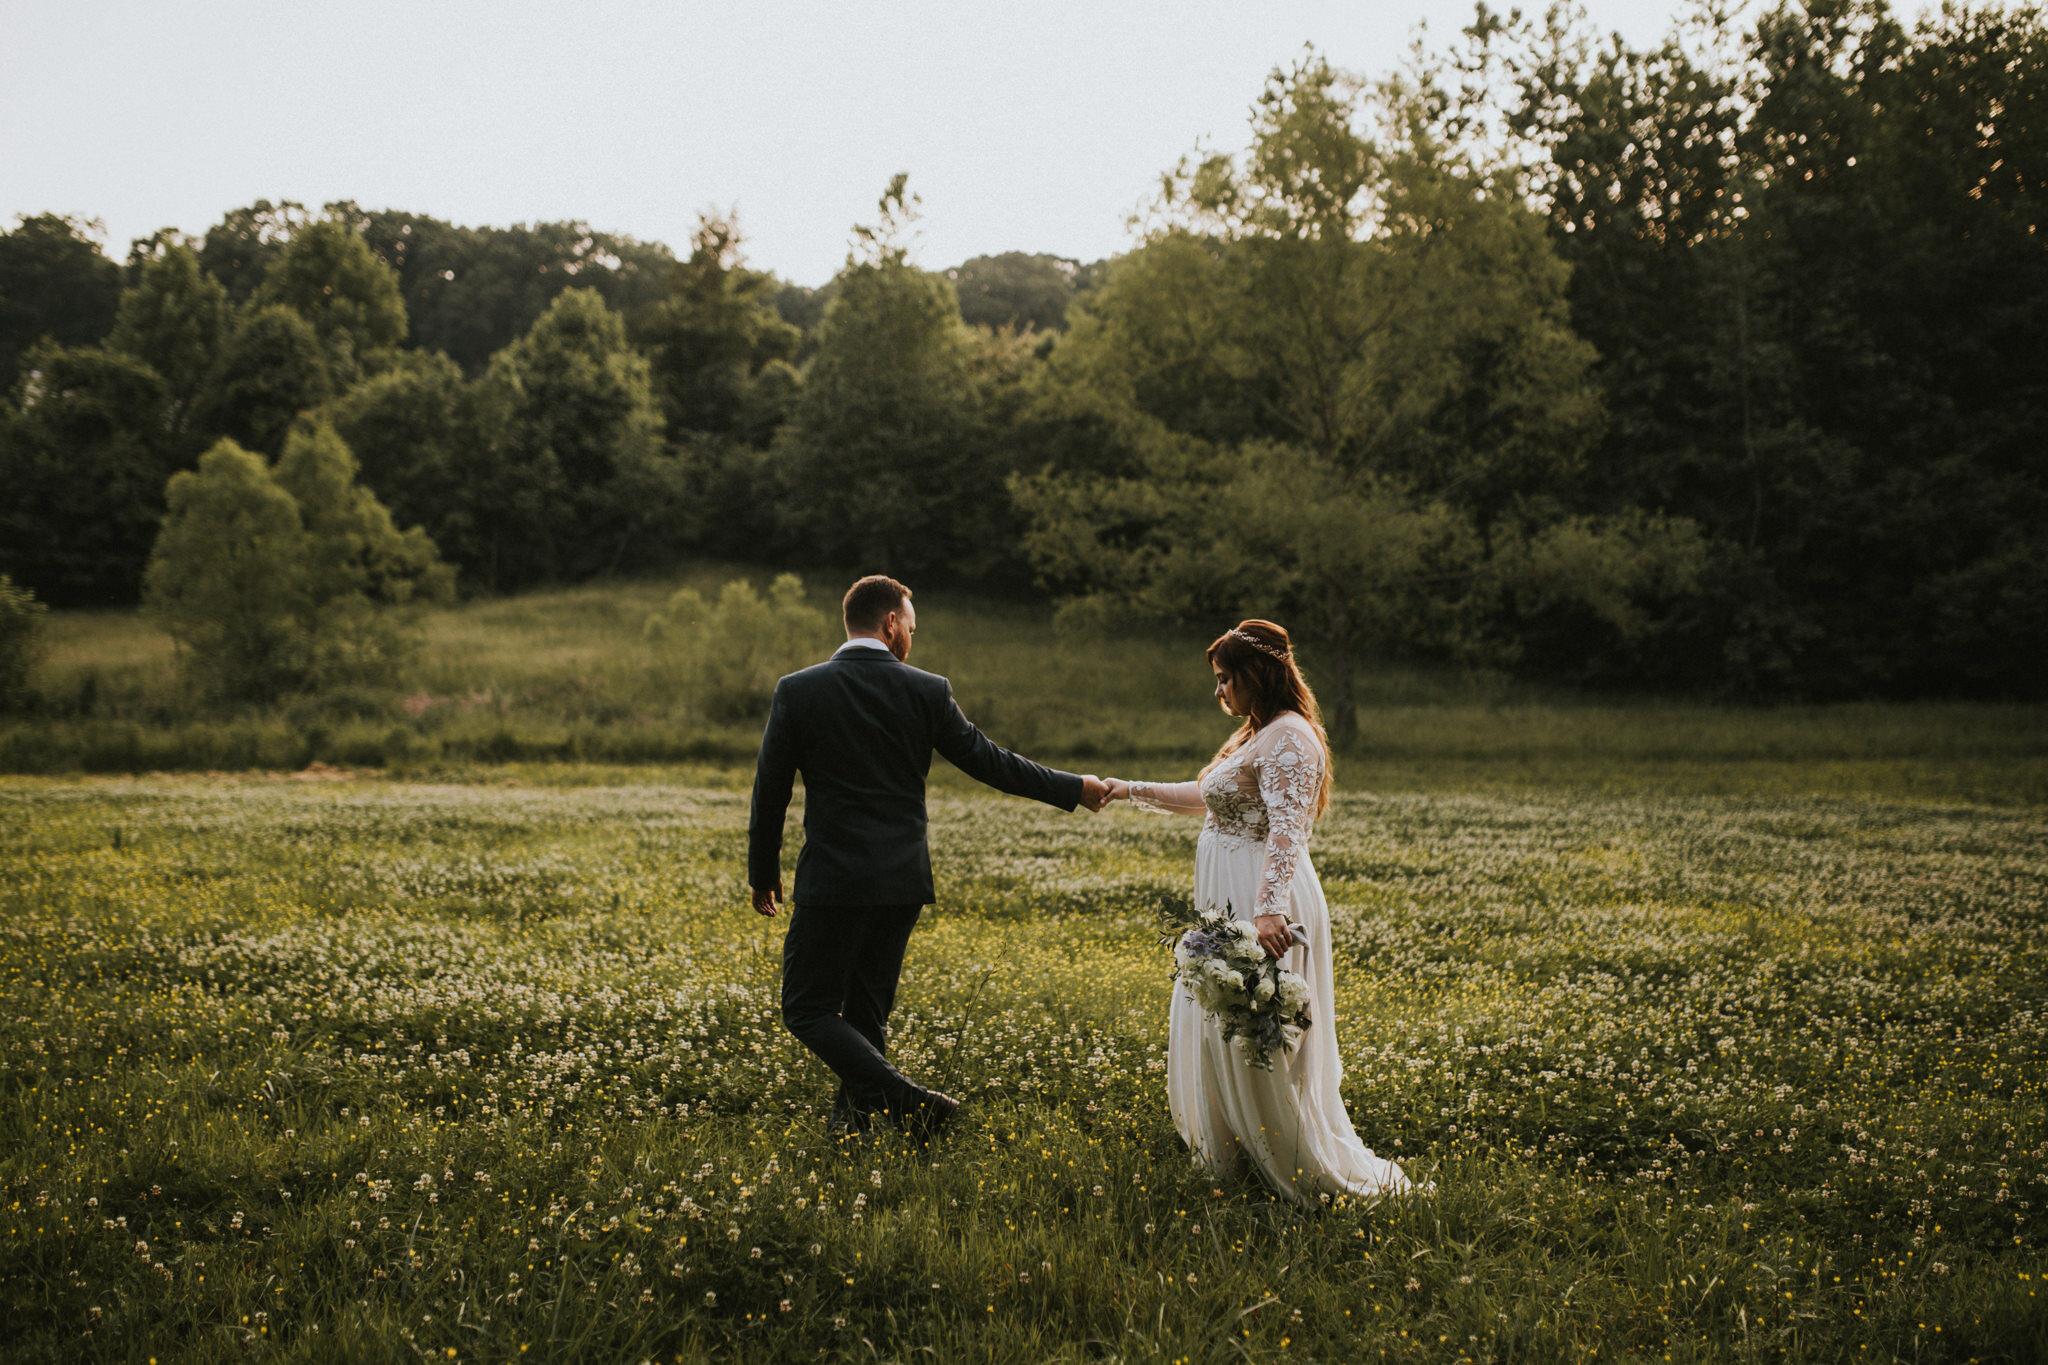 KateMatt-North-Georgia-Wedding-Photographer-Mountain-Laurel-Farm-136.jpg